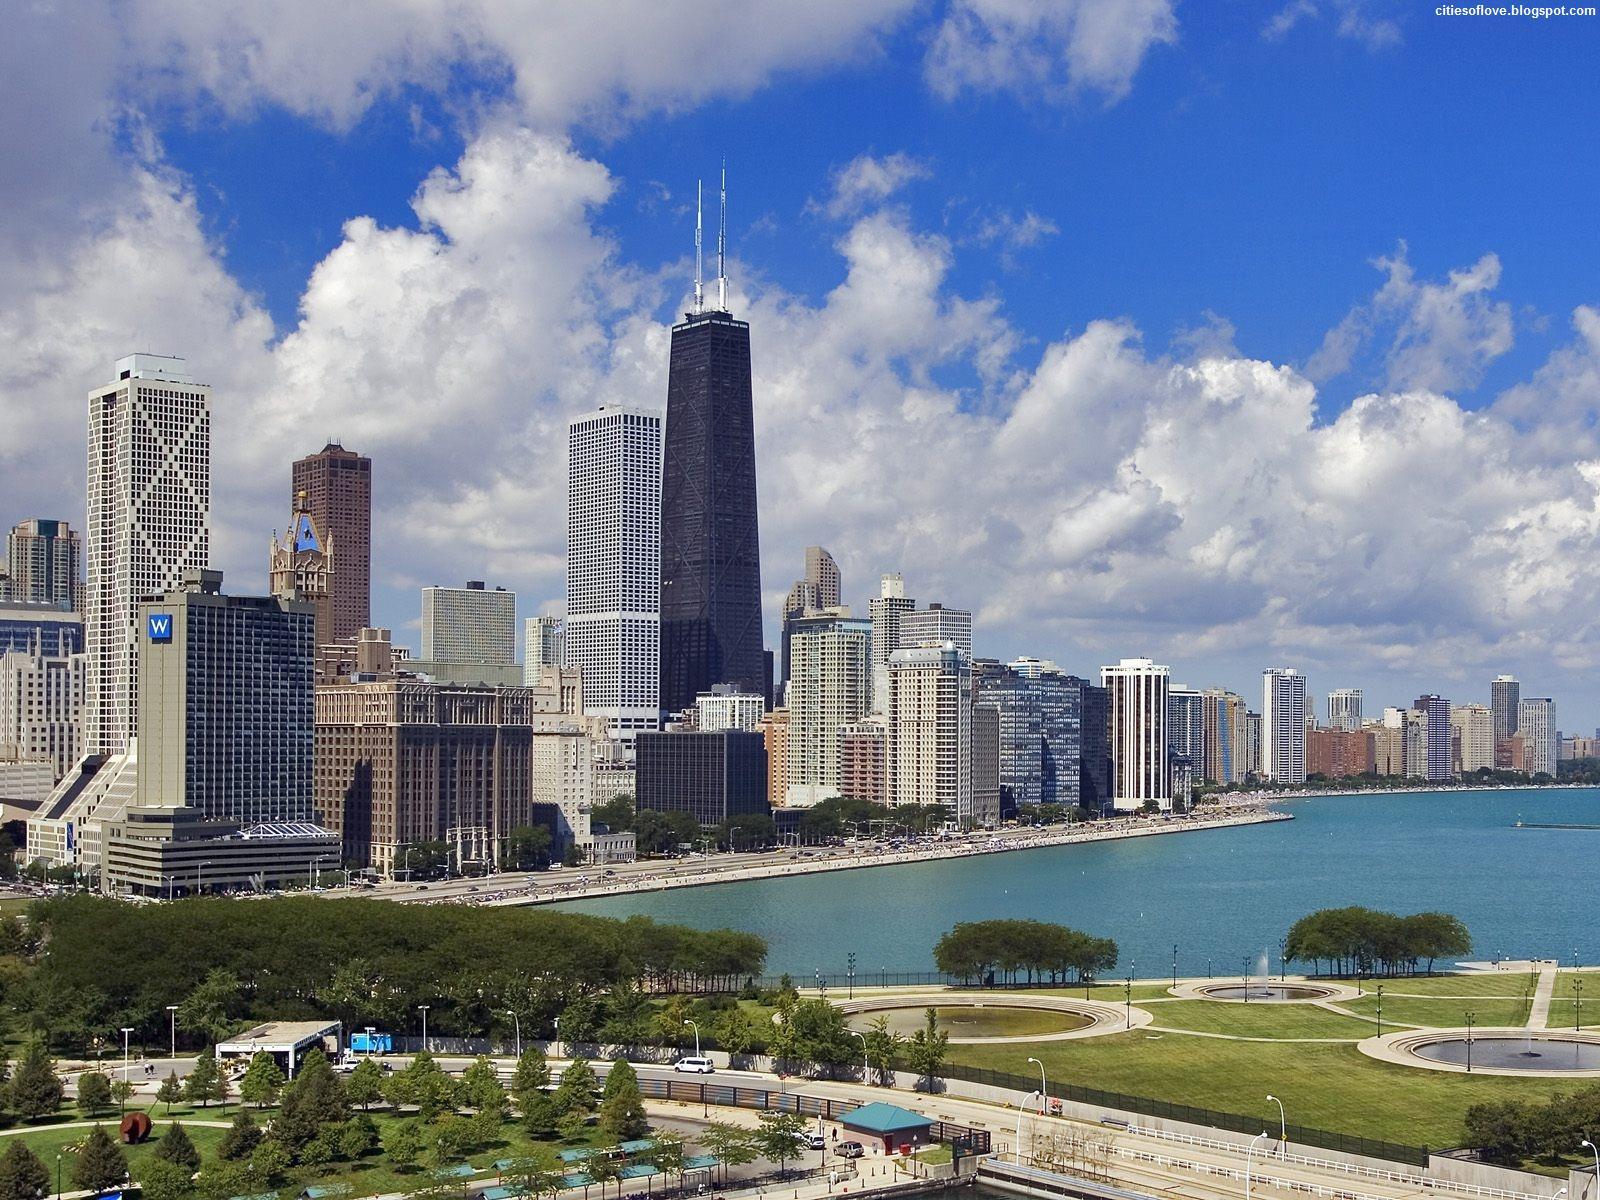 The Gold Coast Of Chicago Illinois Wonderful Atmosphere ...